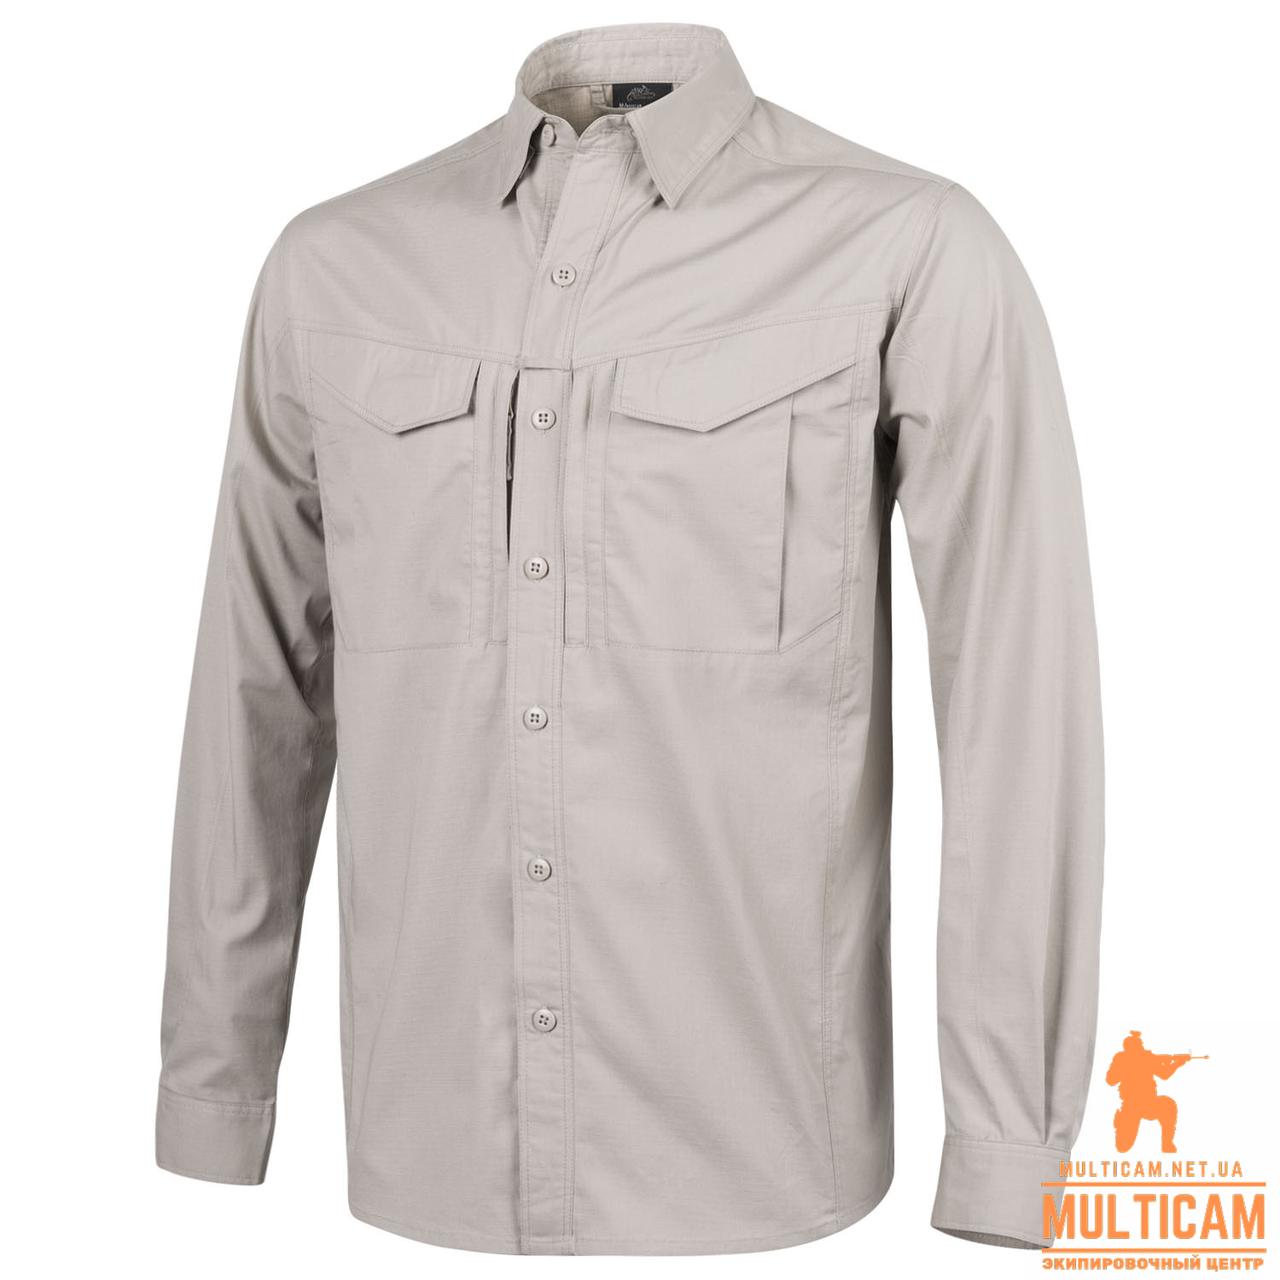 Рубашка Helikon-Tex® DEFENDER Mk2 Shirt long sleeve® - PolyCotton Ripstop - Khaki